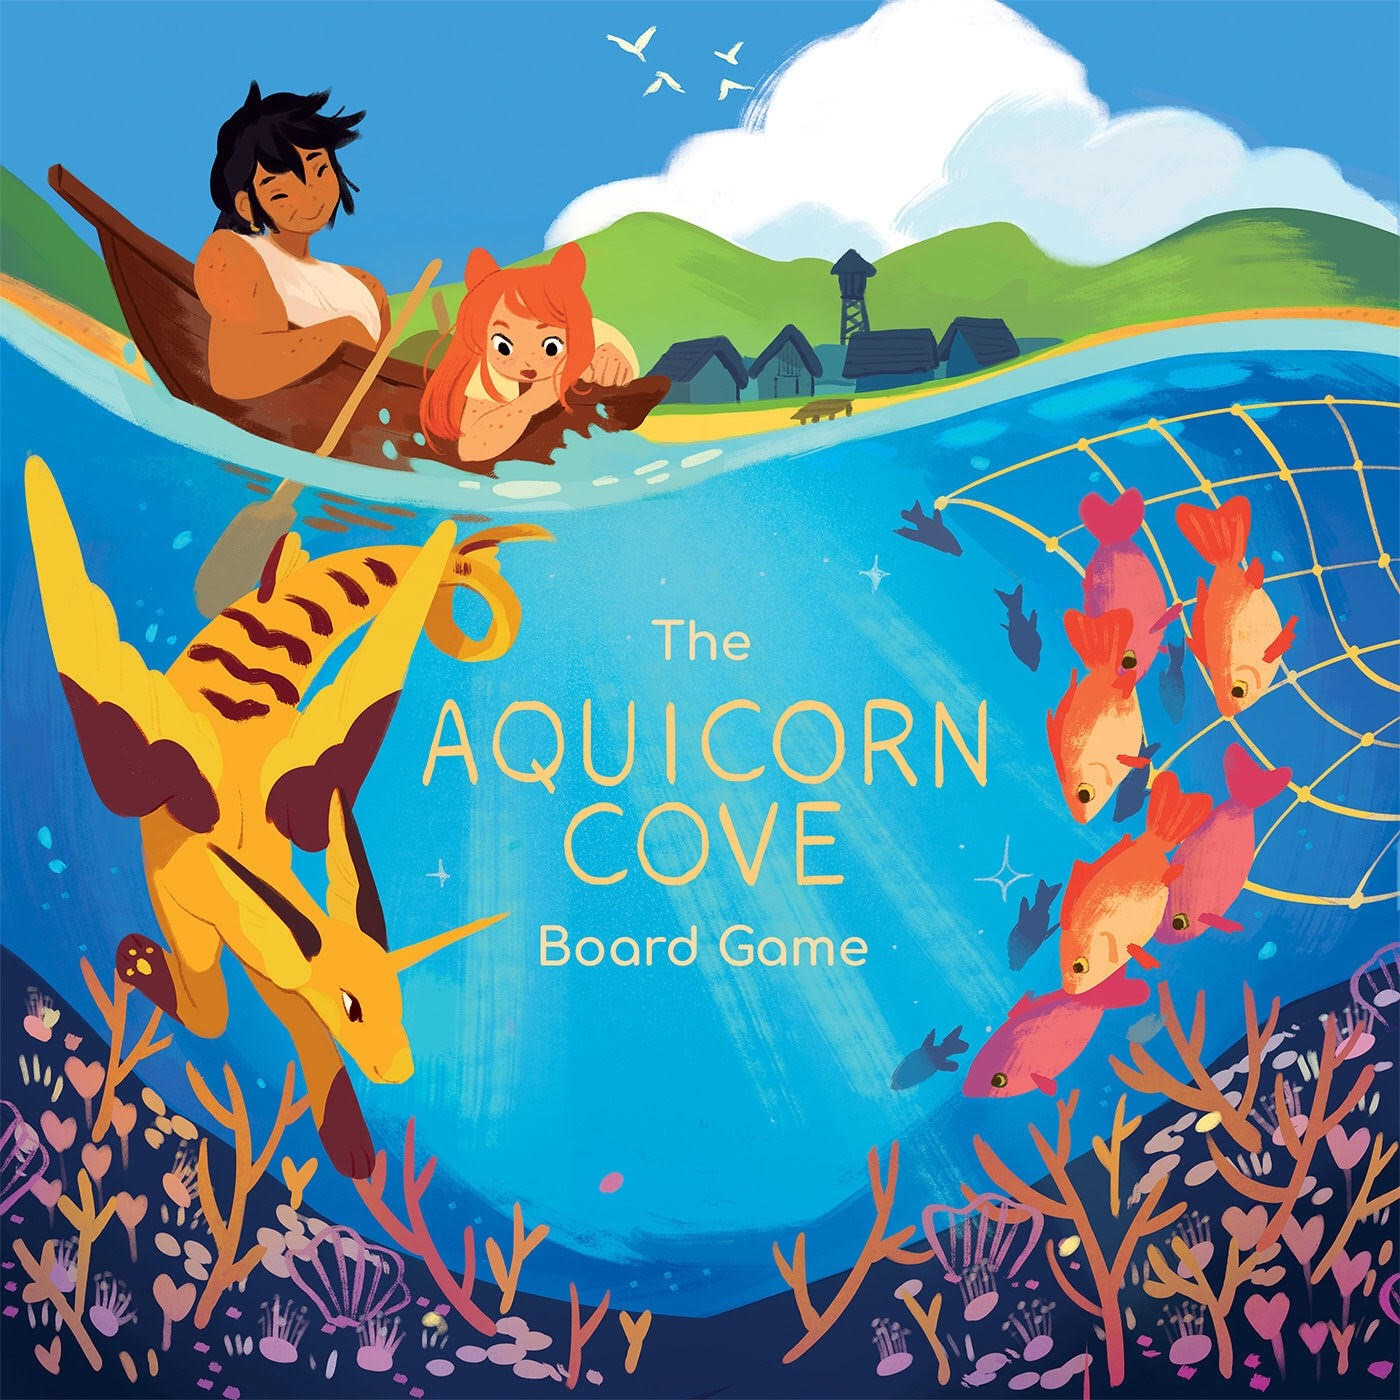 The Aquicorn Cove Game